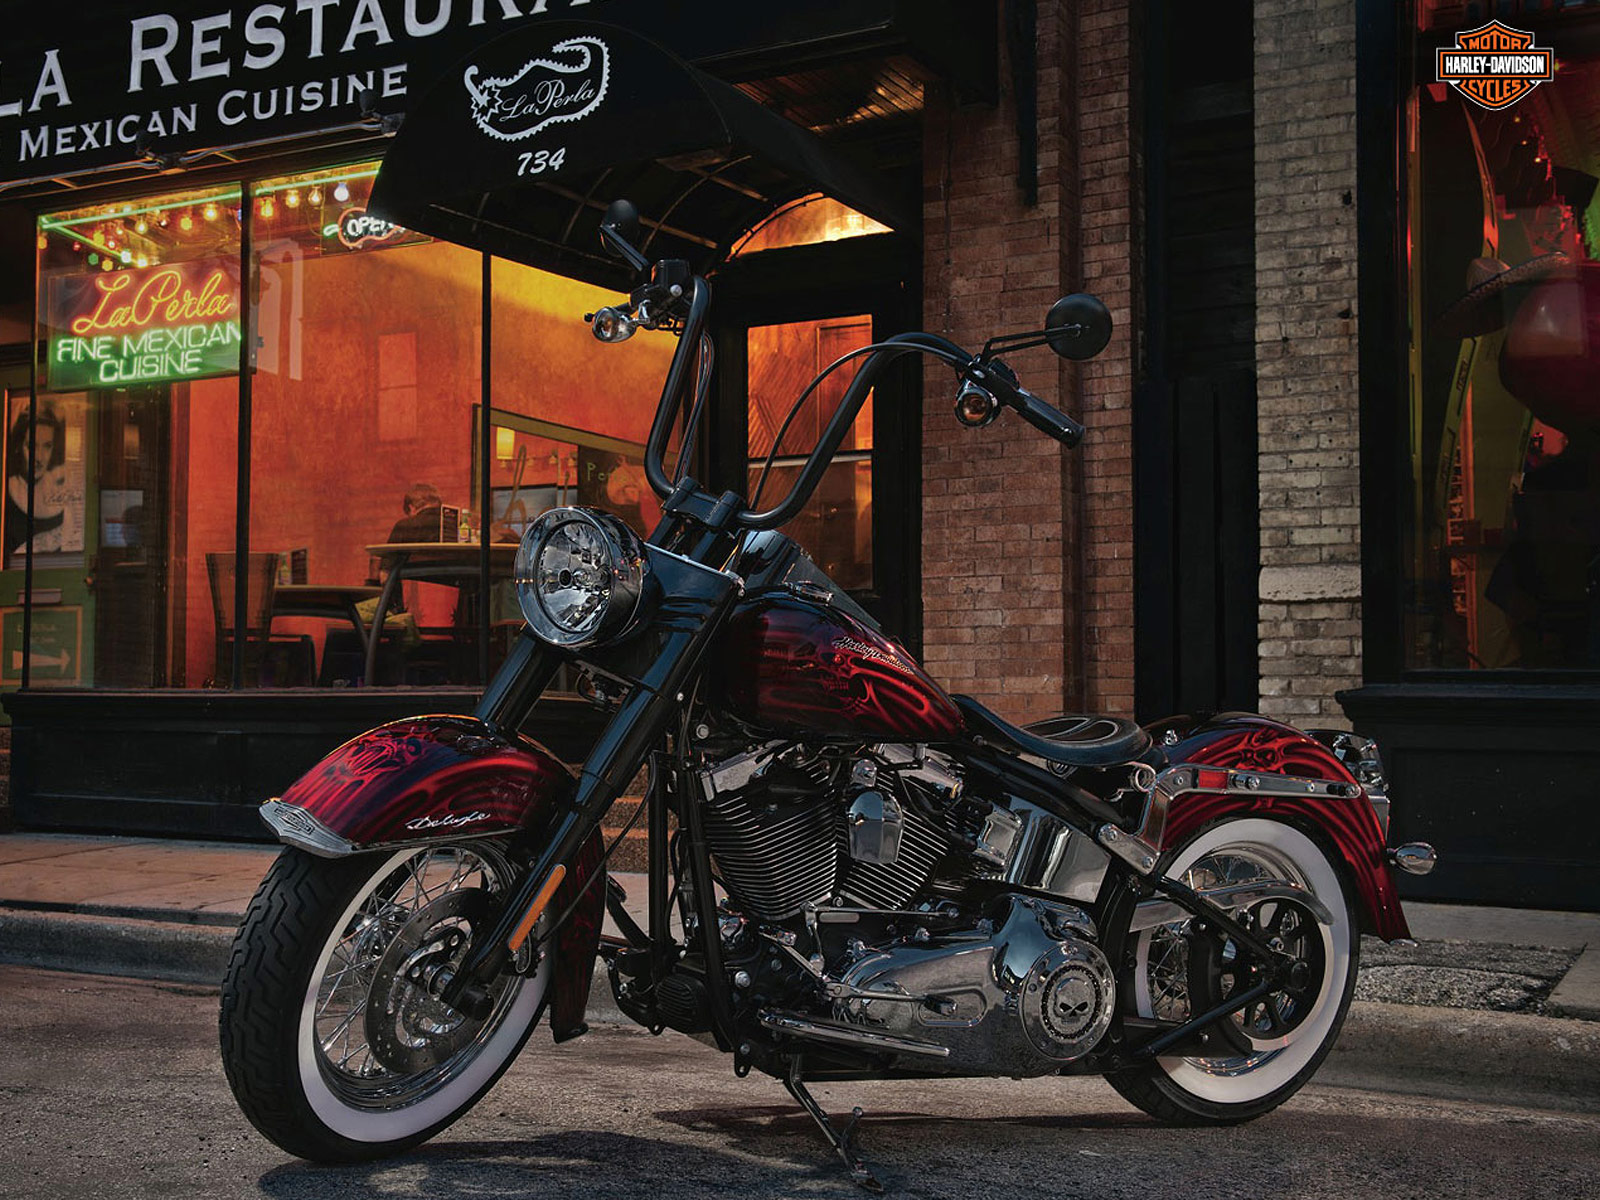 Harley Davidson 2012: 2012 HarleyDavidson FLSTN Softail Deluxe Review